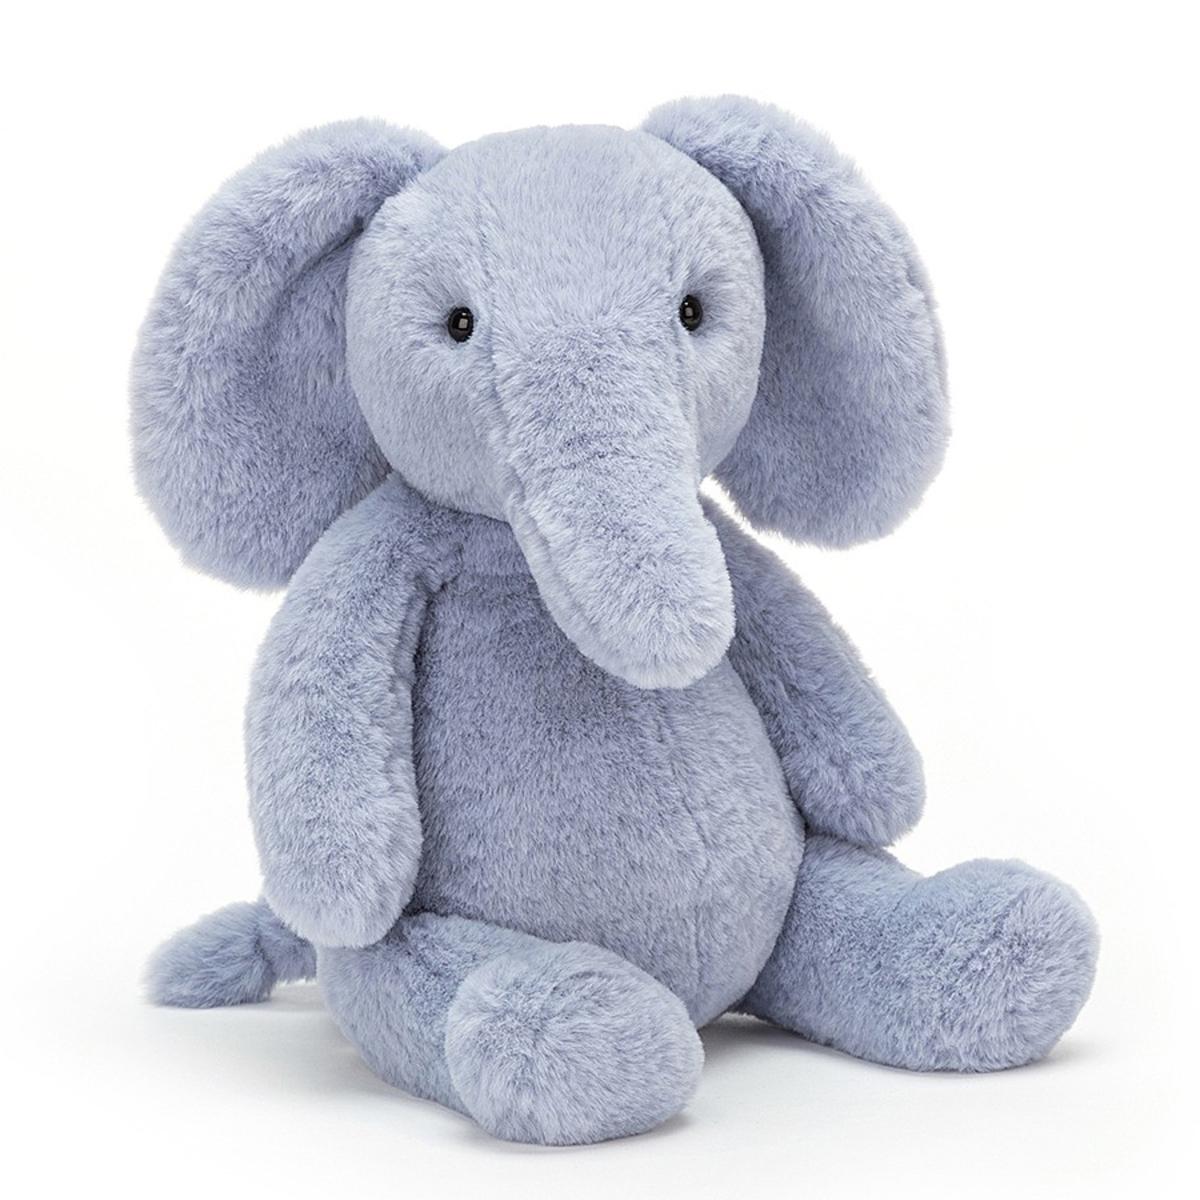 Peluche Puffles Elephant Puffles Elephant